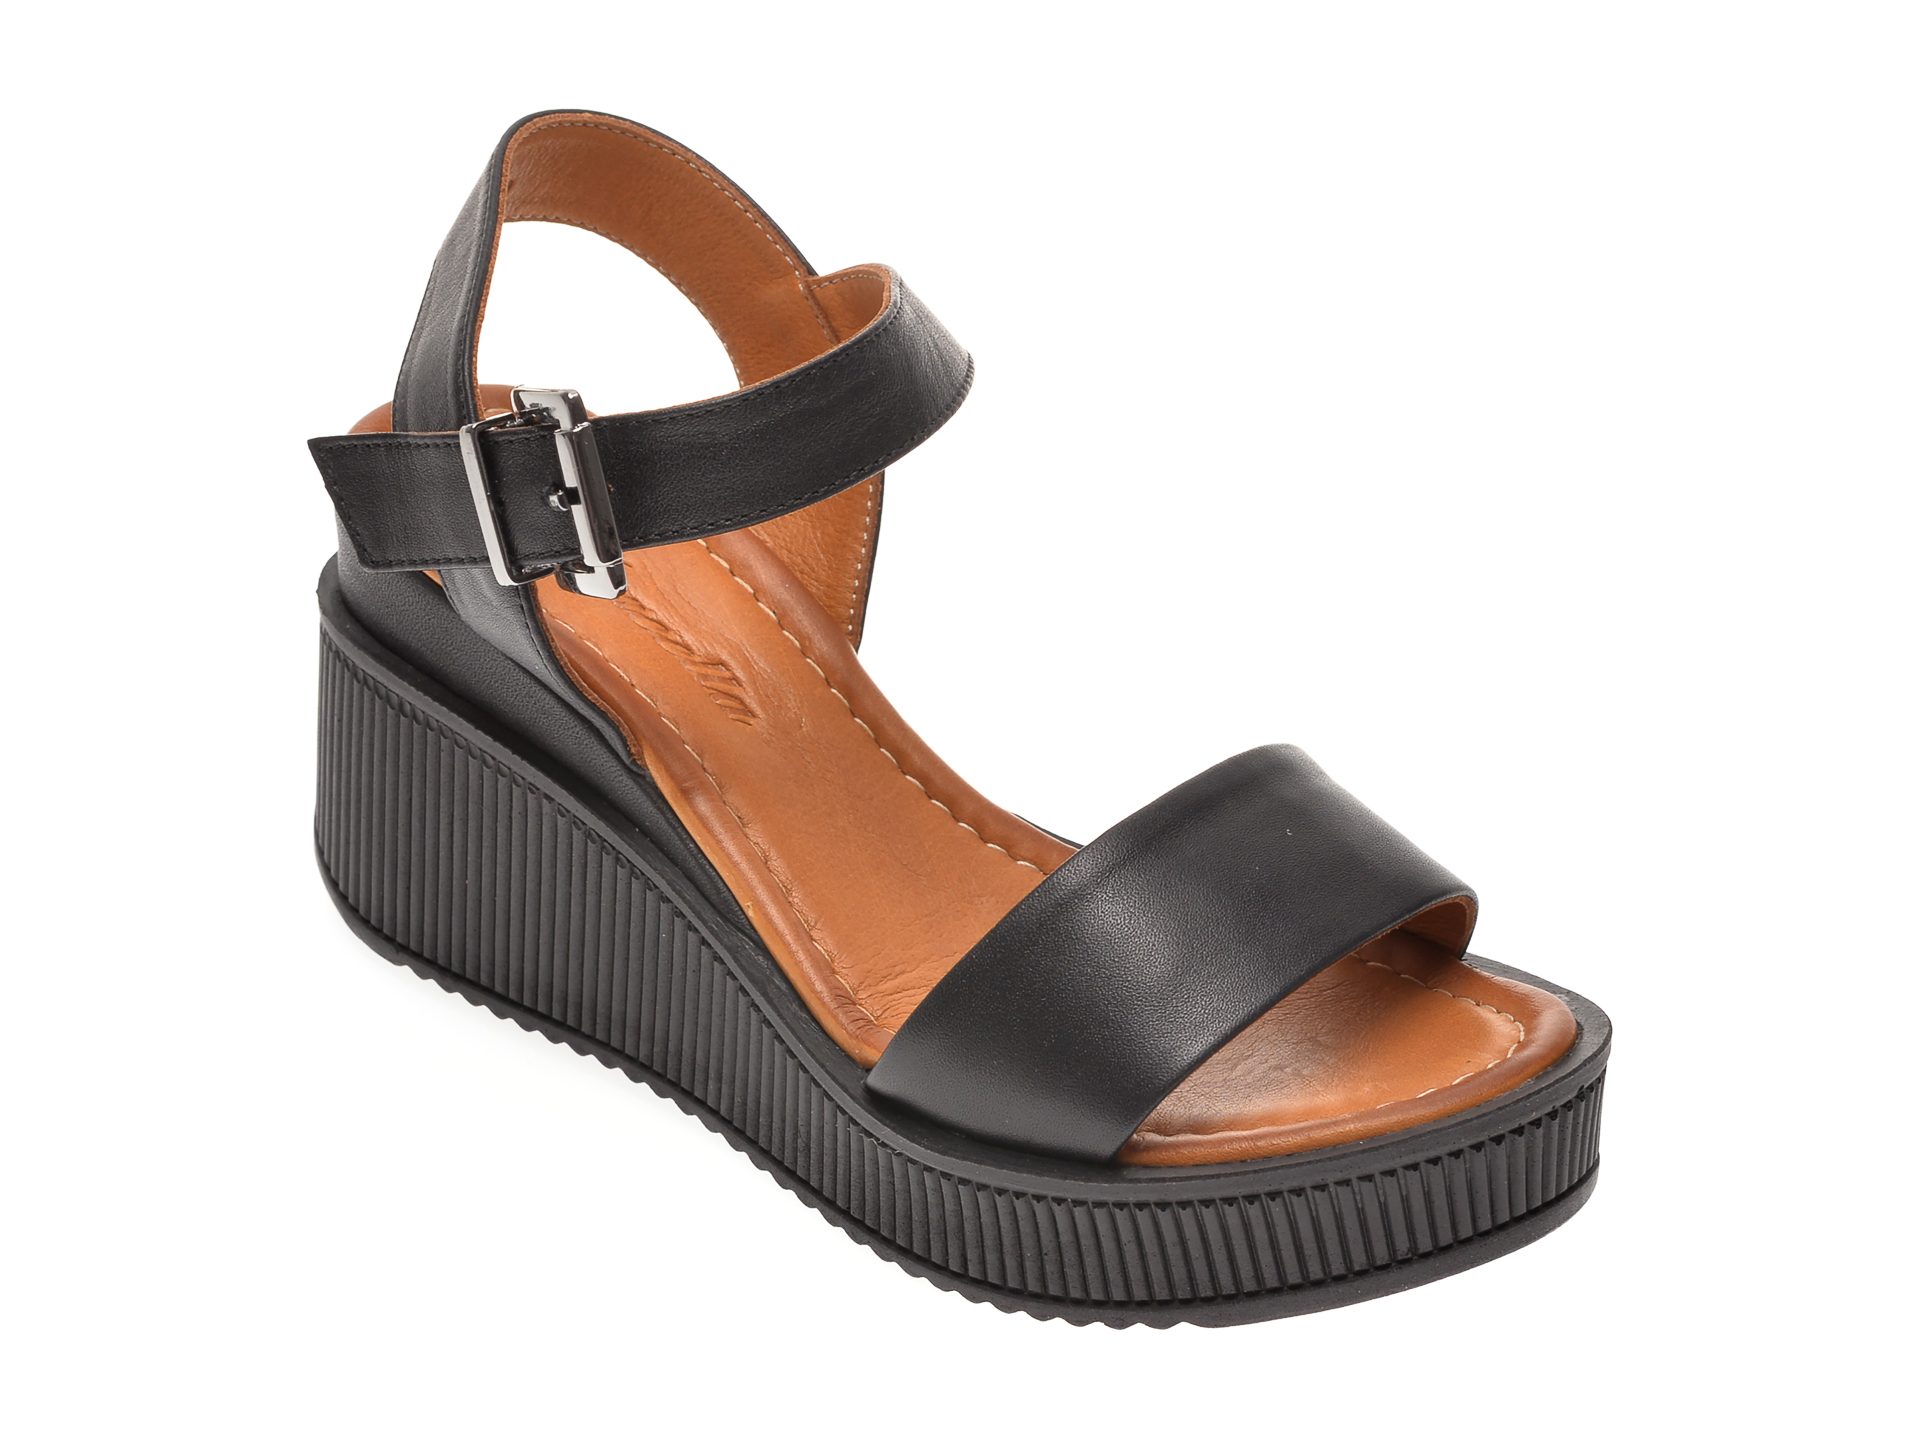 Sandale MISS LIZA negre, 1181910, din piele naturala